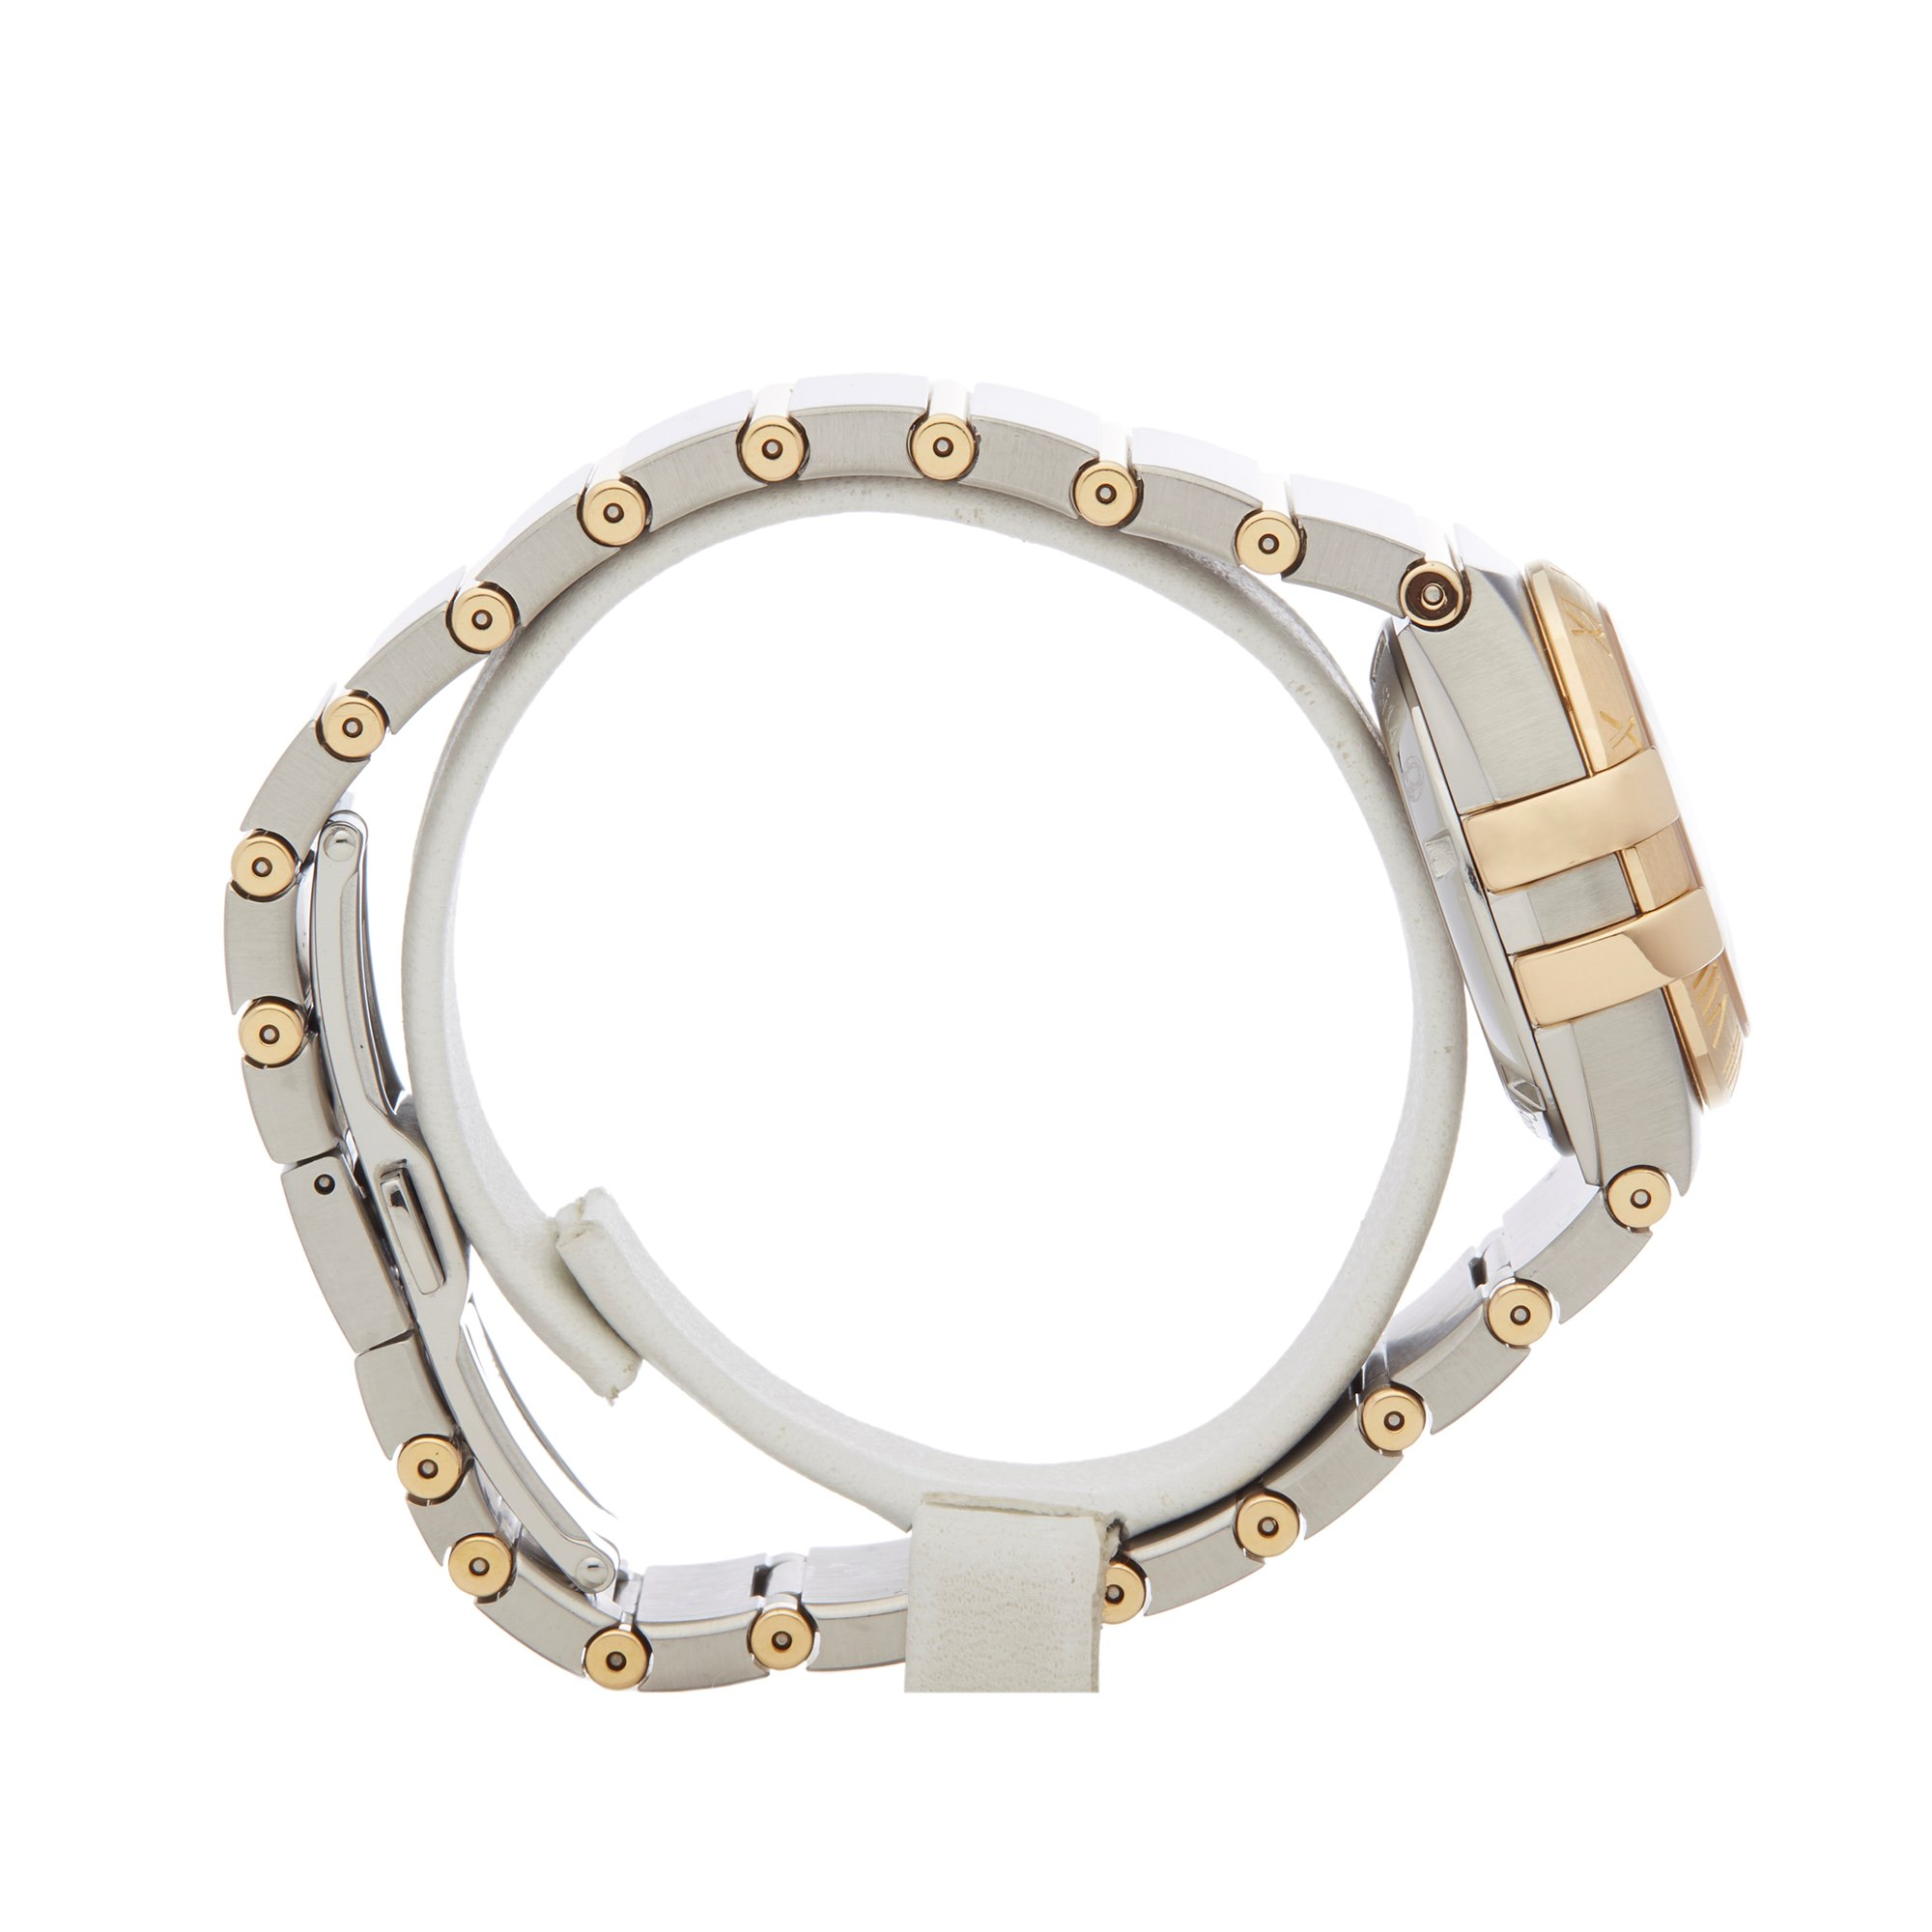 Omega Constellation Diamond Stainless Steel & Yellow Gold 123.20.27.20.57.002